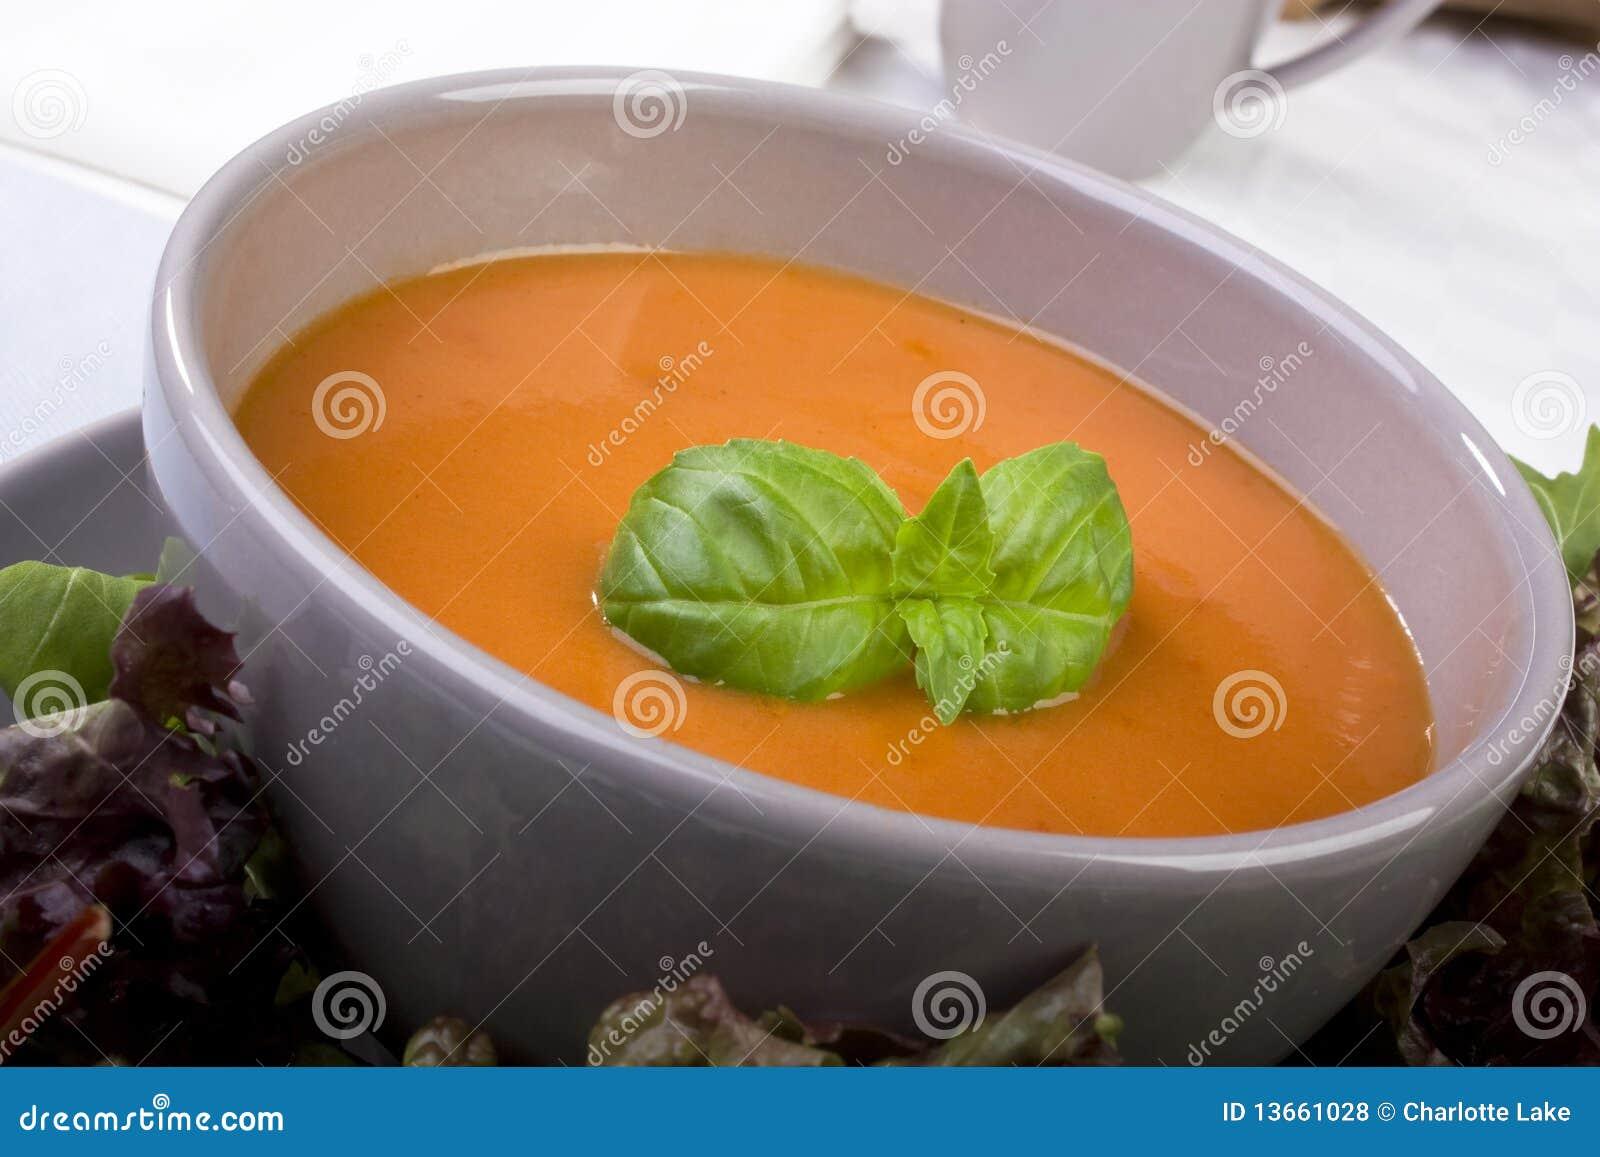 Tomato Soup With Basil Garnish Stock Photo - Image: 13661028 Cream Of Tomato Soup With Garnish